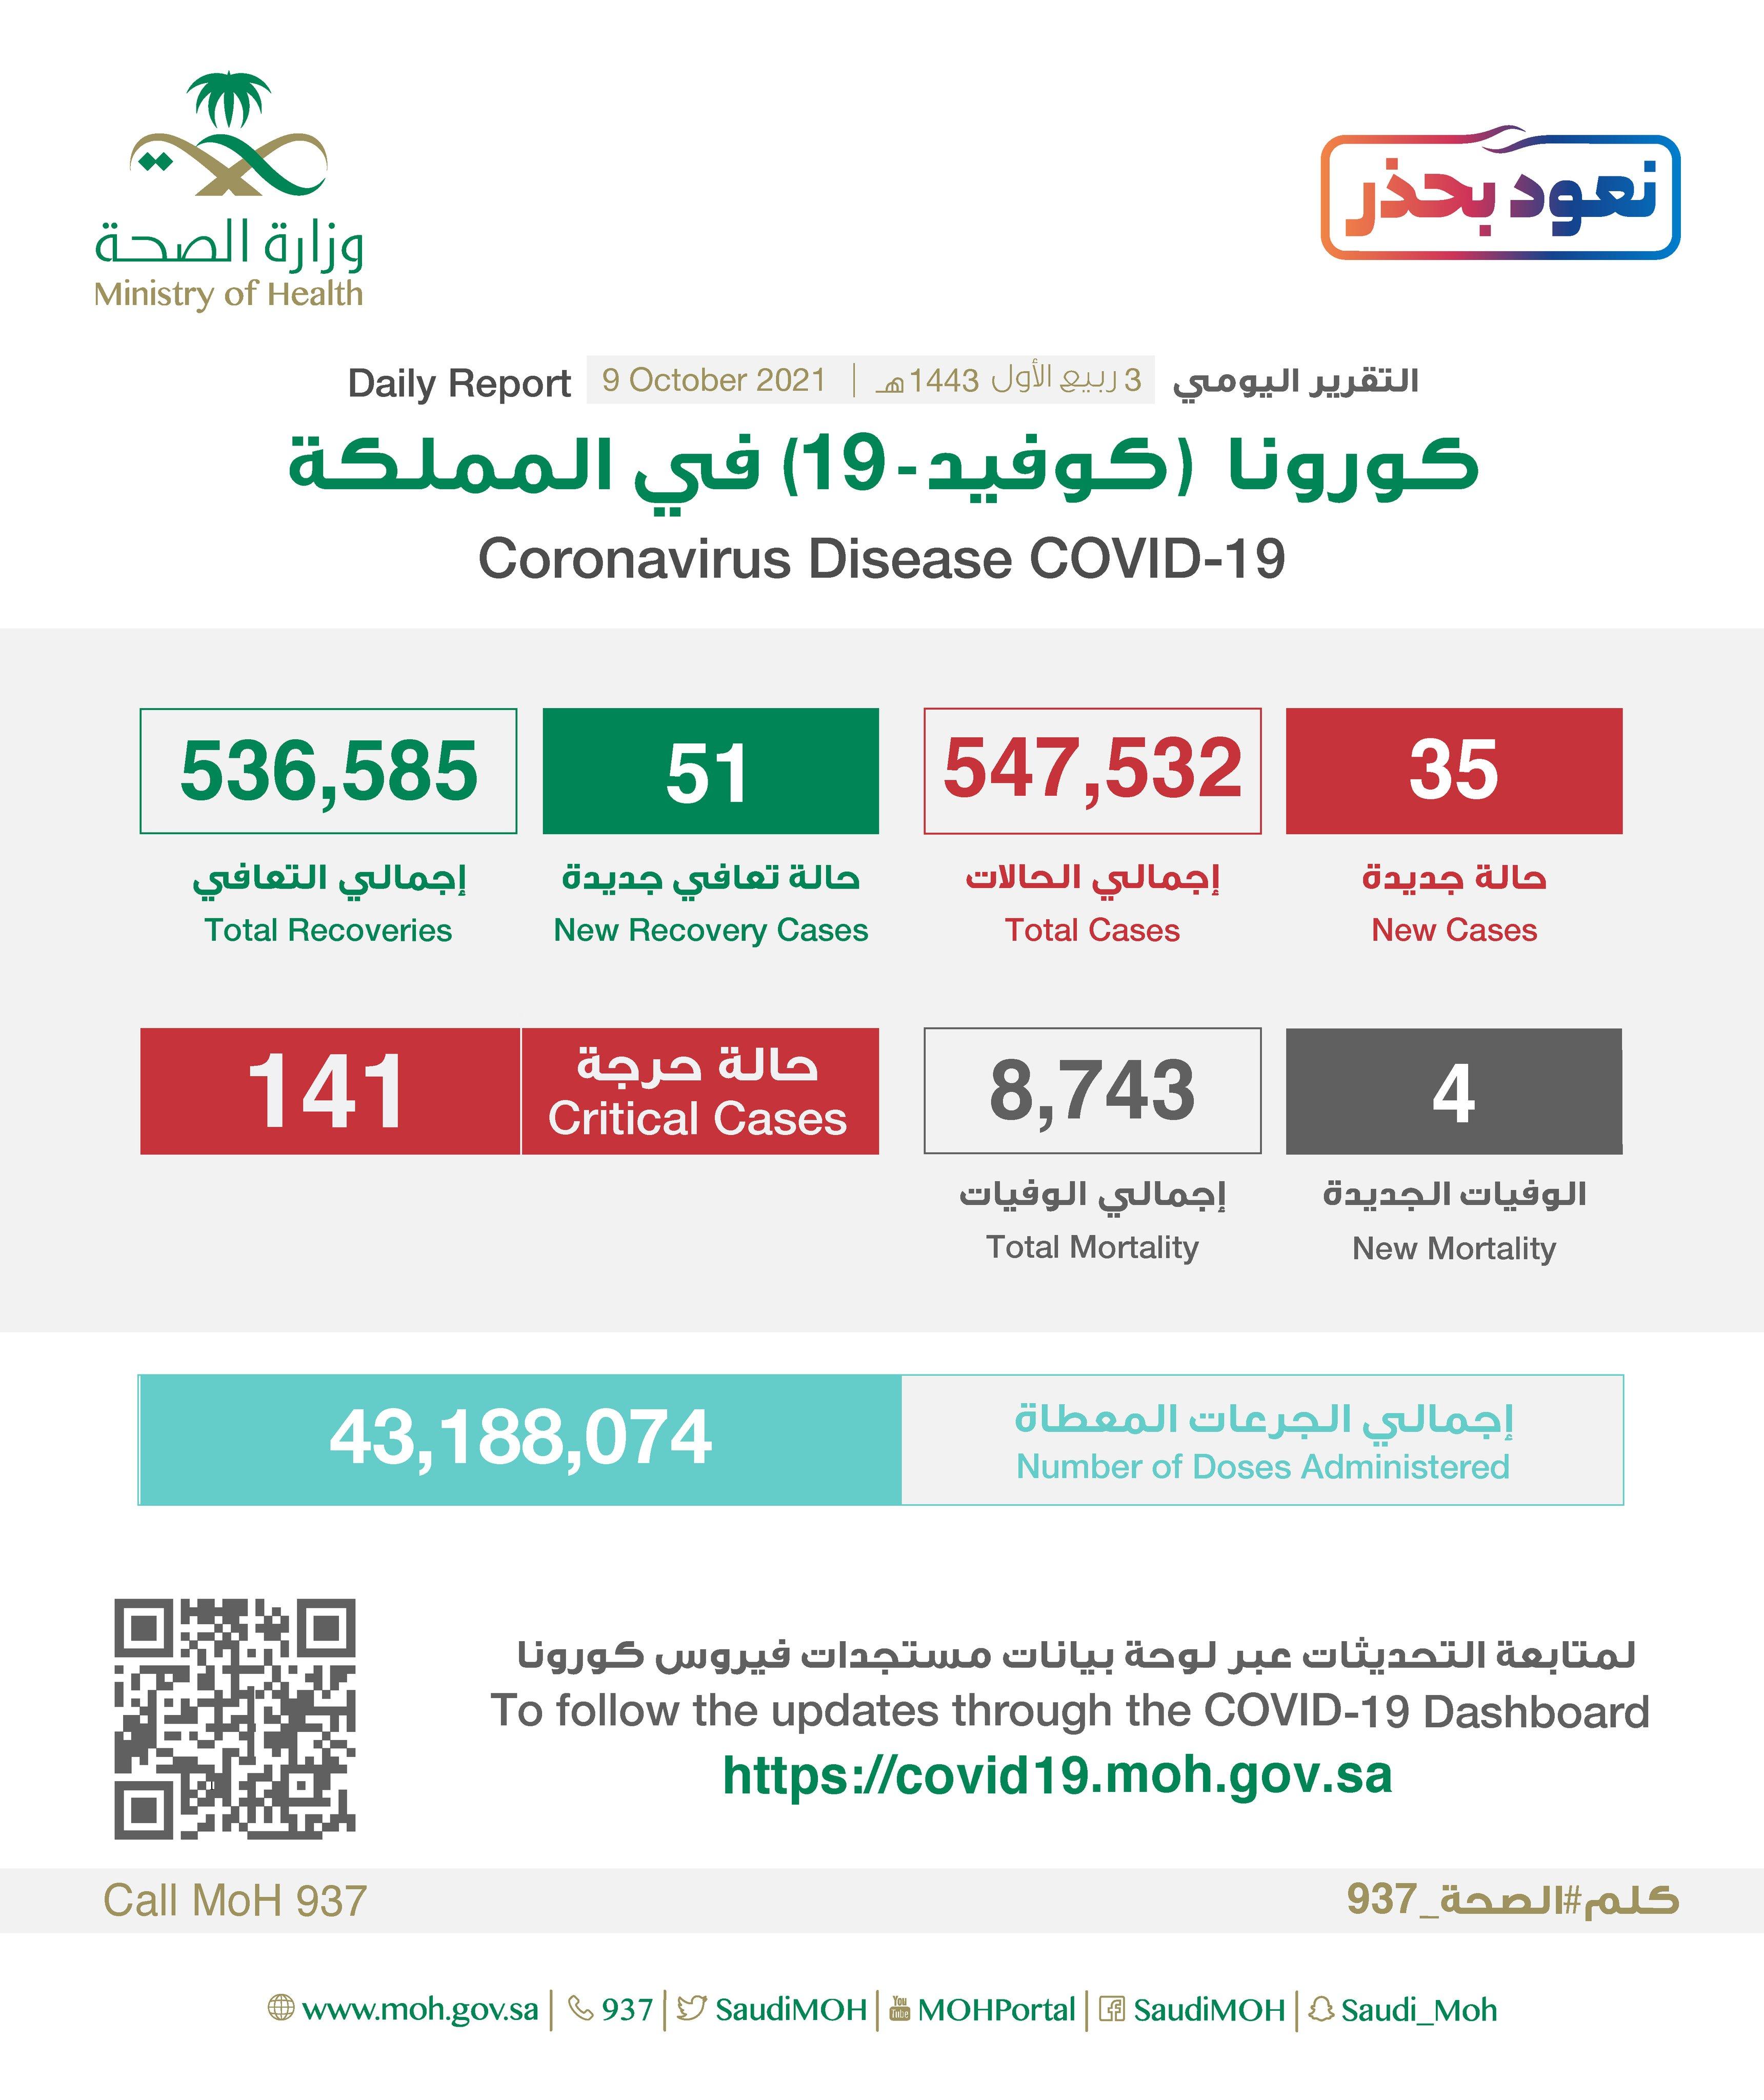 Saudi Arabia Coronavirus : Total Cases : 547,532, New Cases : 35, Cured : 536,585 , Deaths: 8,743, Active Cases : 2,204